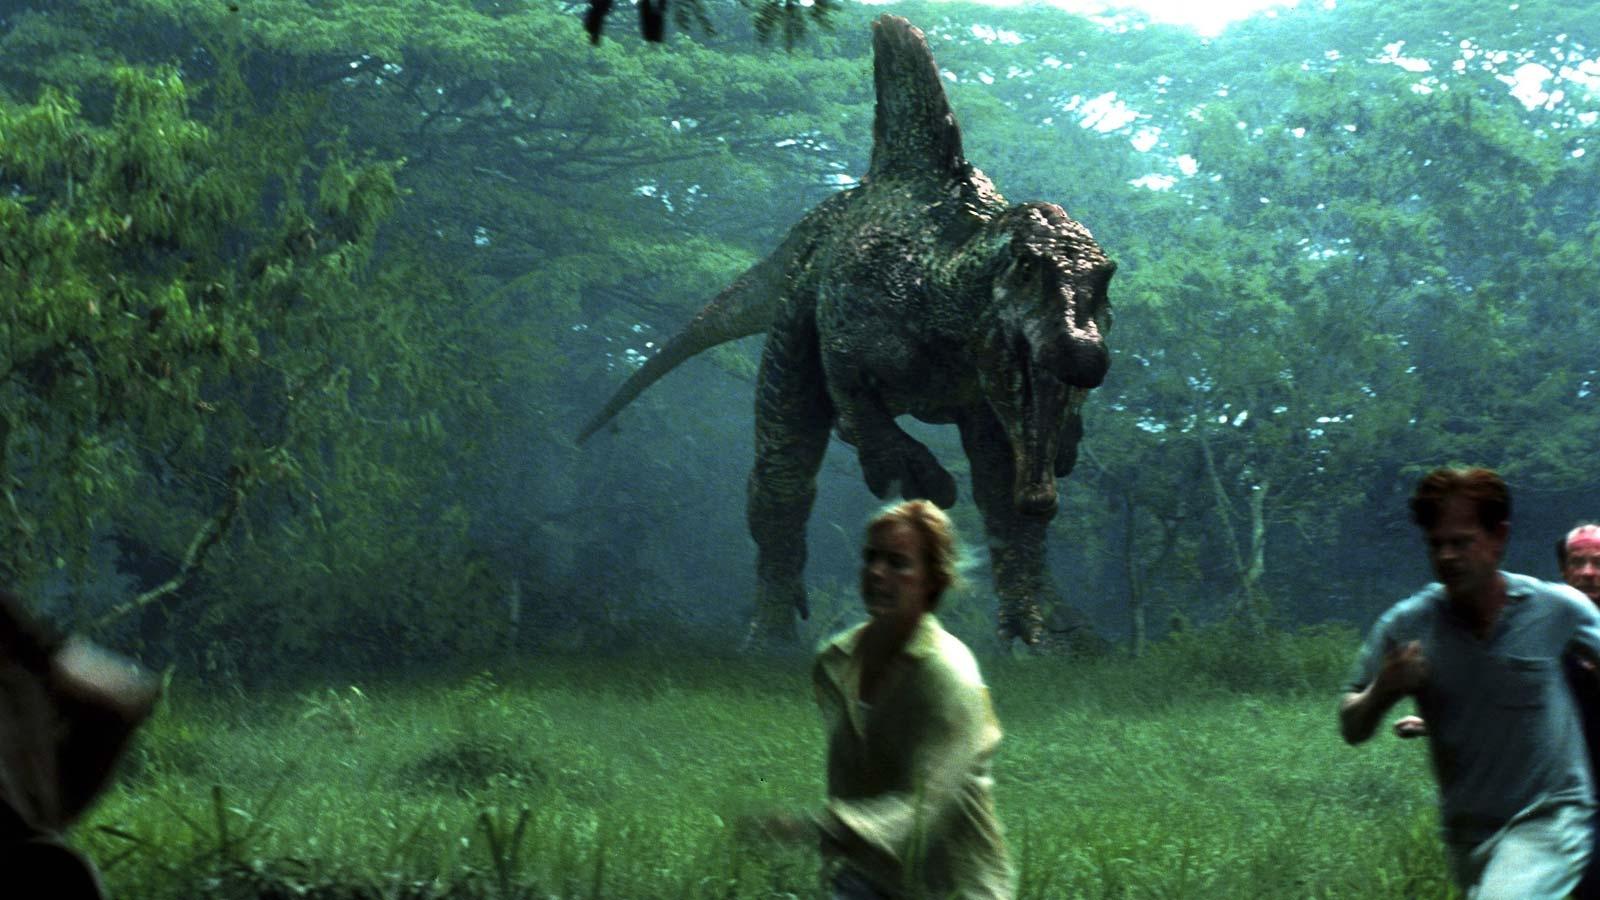 RECAP: Jurassic Park III - The Exploder: Action Movie Recaps